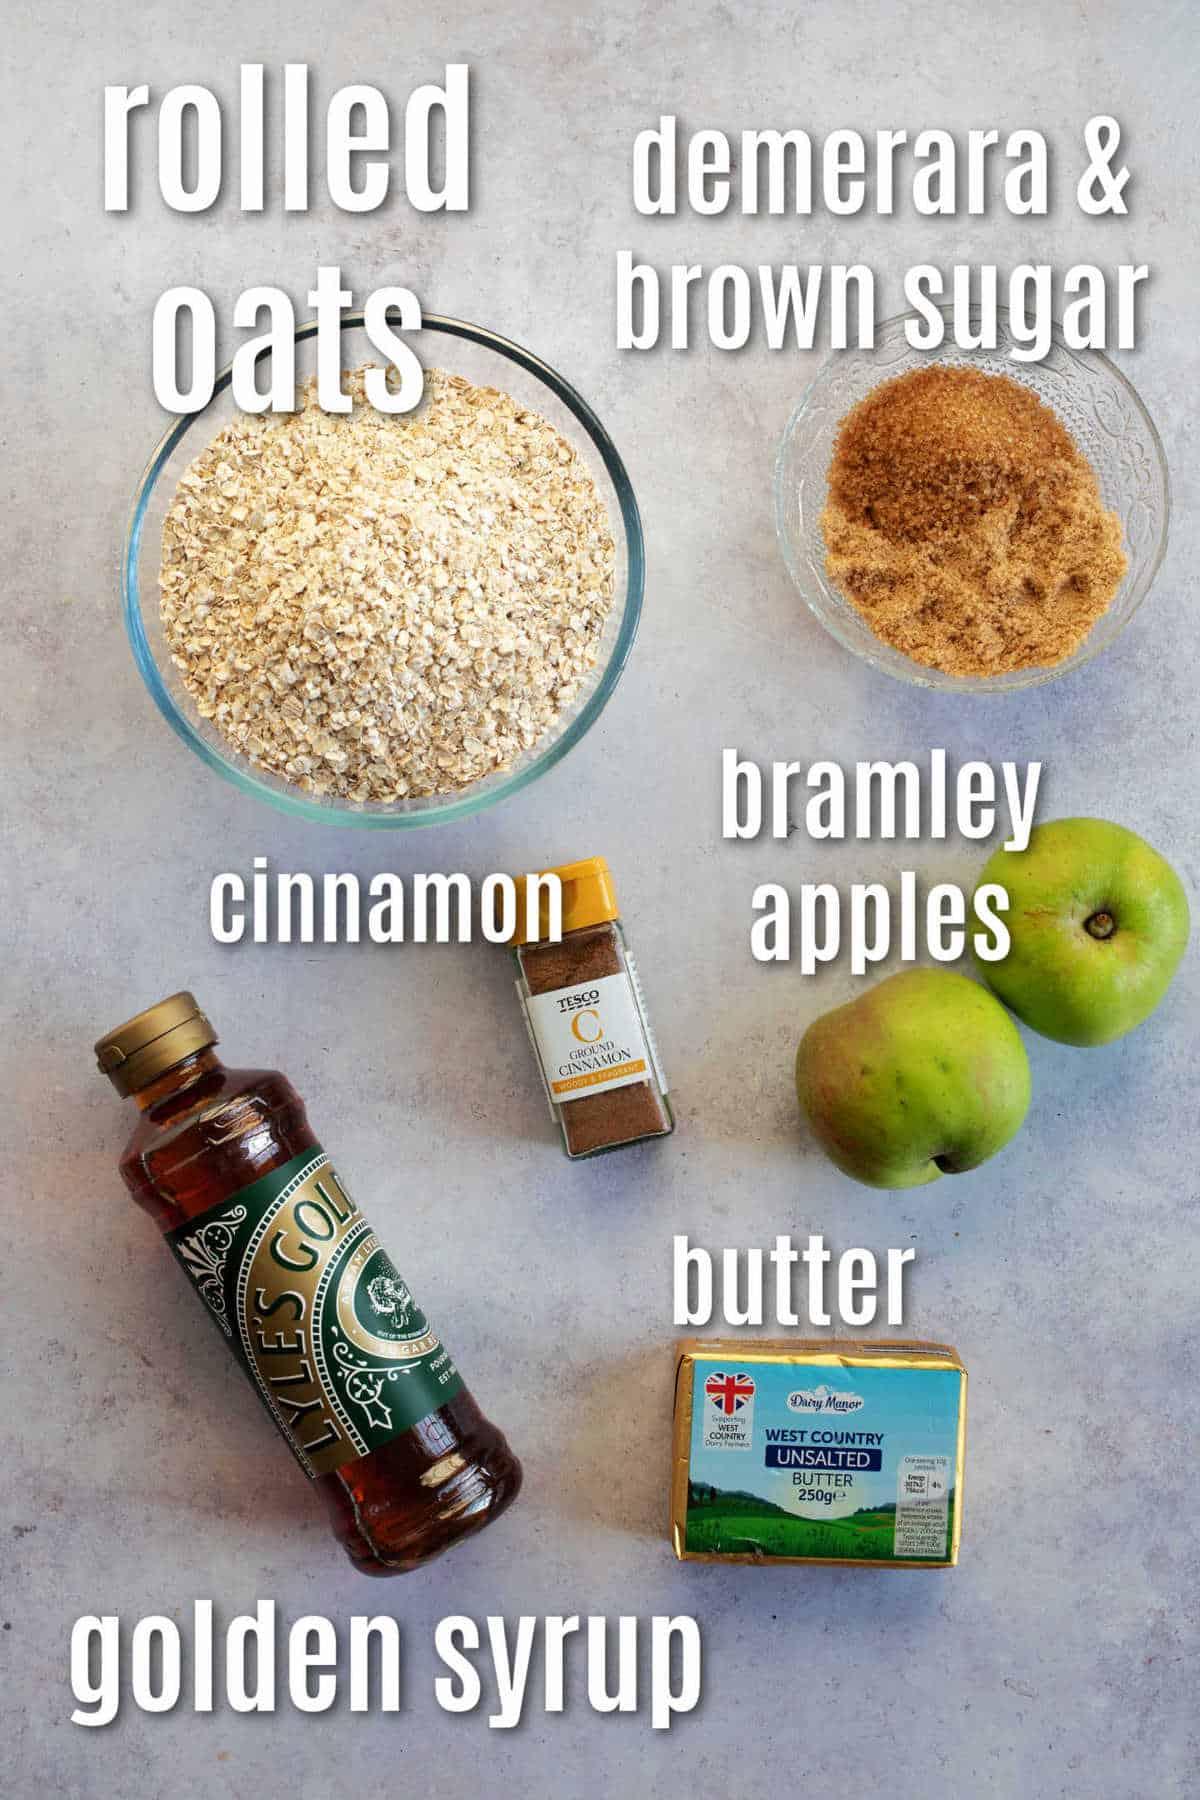 Ingredients for apple crumble flapjacks.